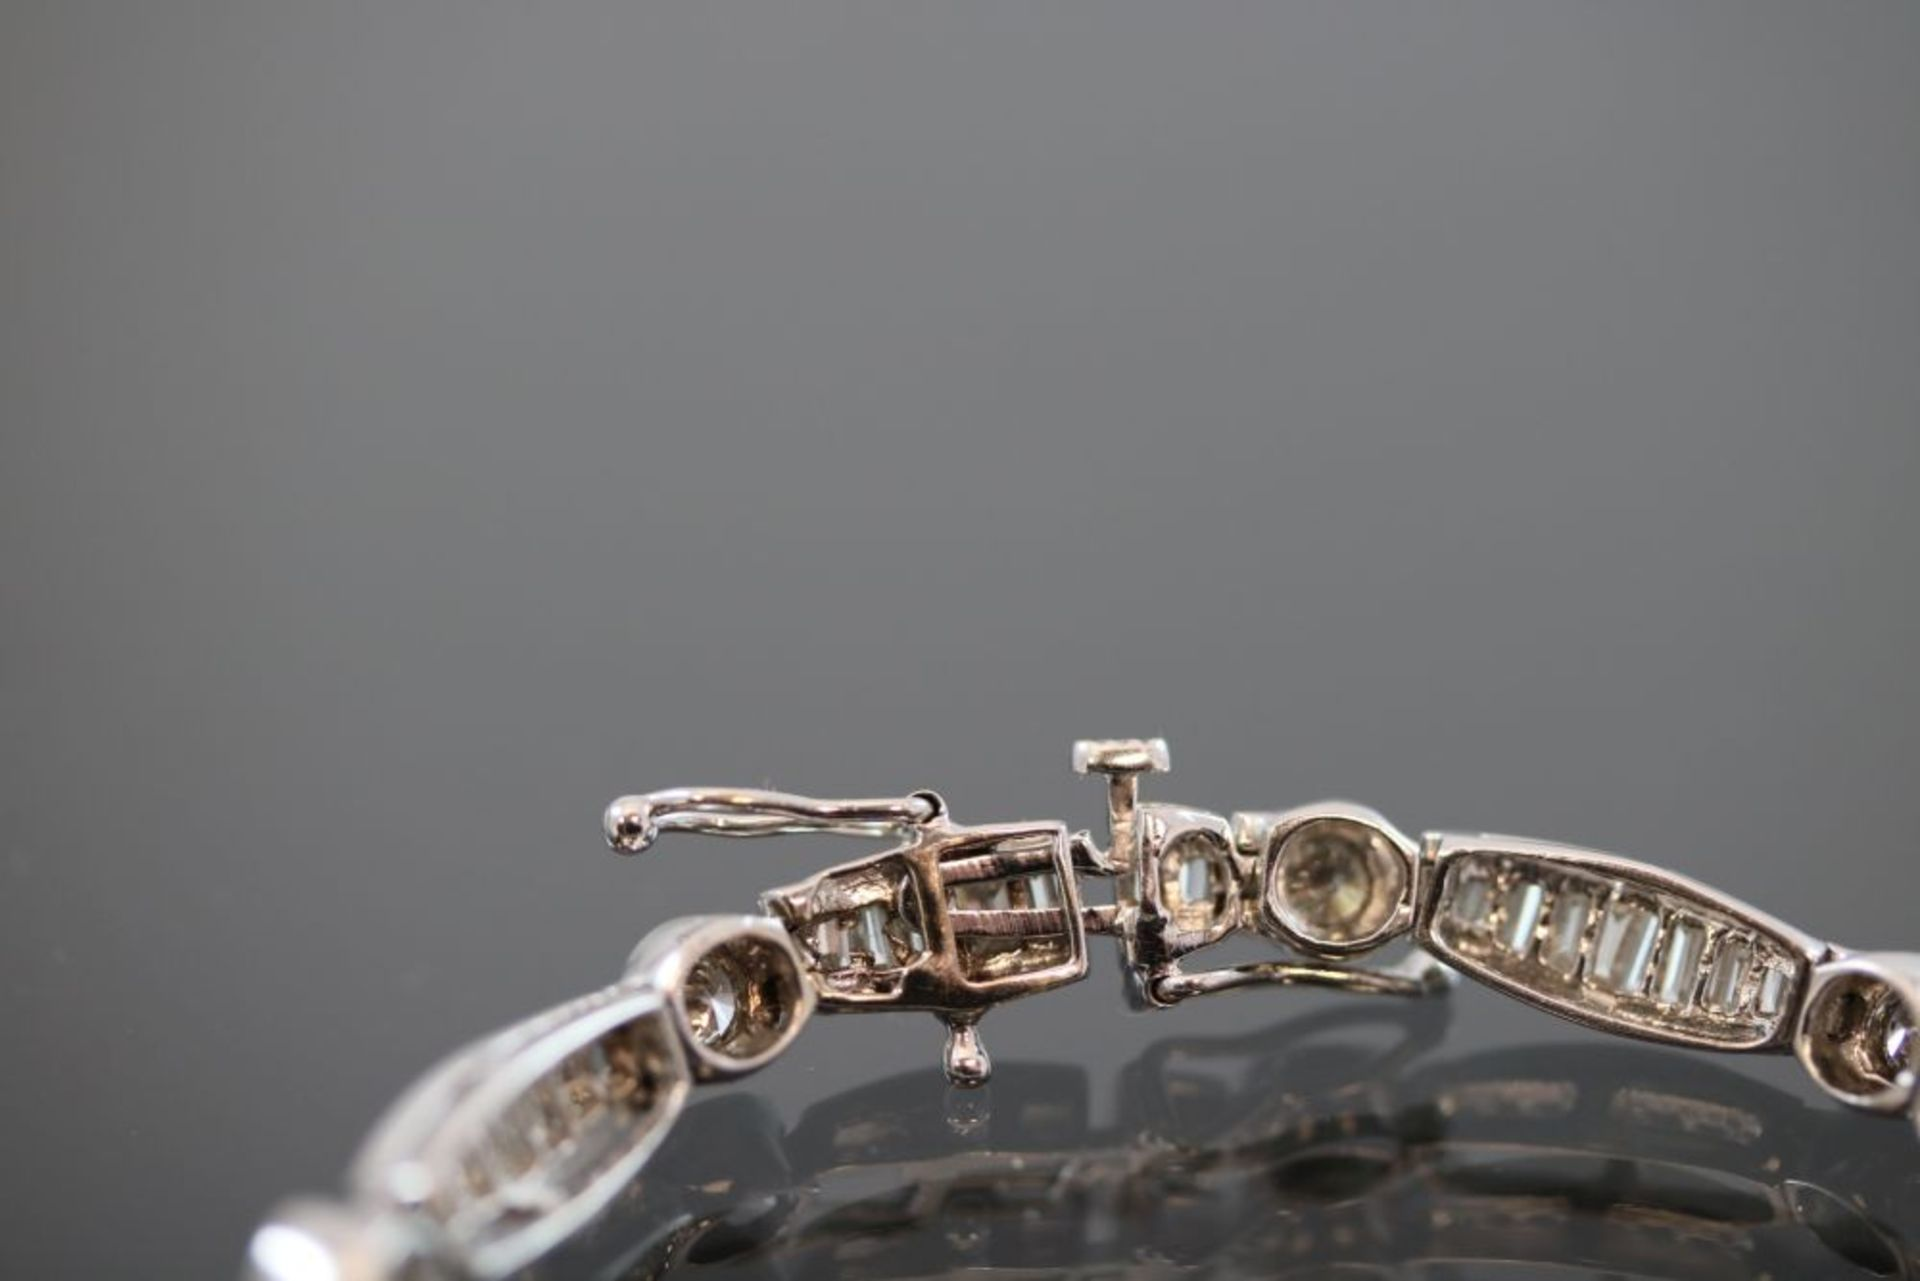 Brillant-Diamant-Armband, 750 Weißgold - Image 2 of 3